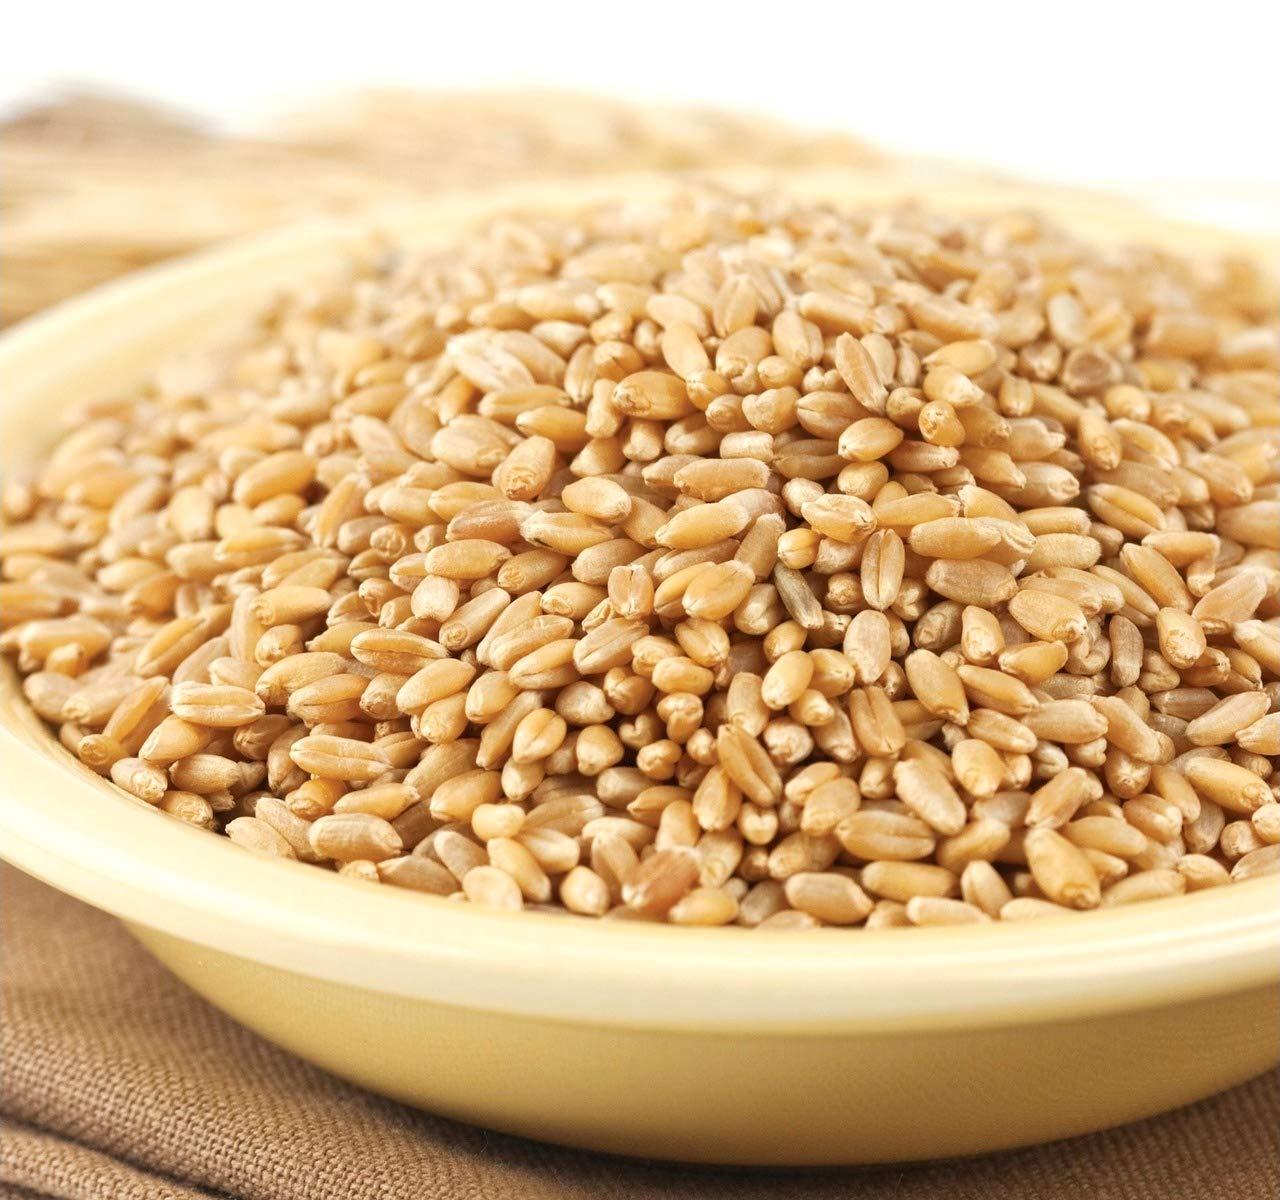 Wheat Montana - Prairie Gold Wheat Berries - 1 pack - 50lb bag by Wheat Montana (Image #2)